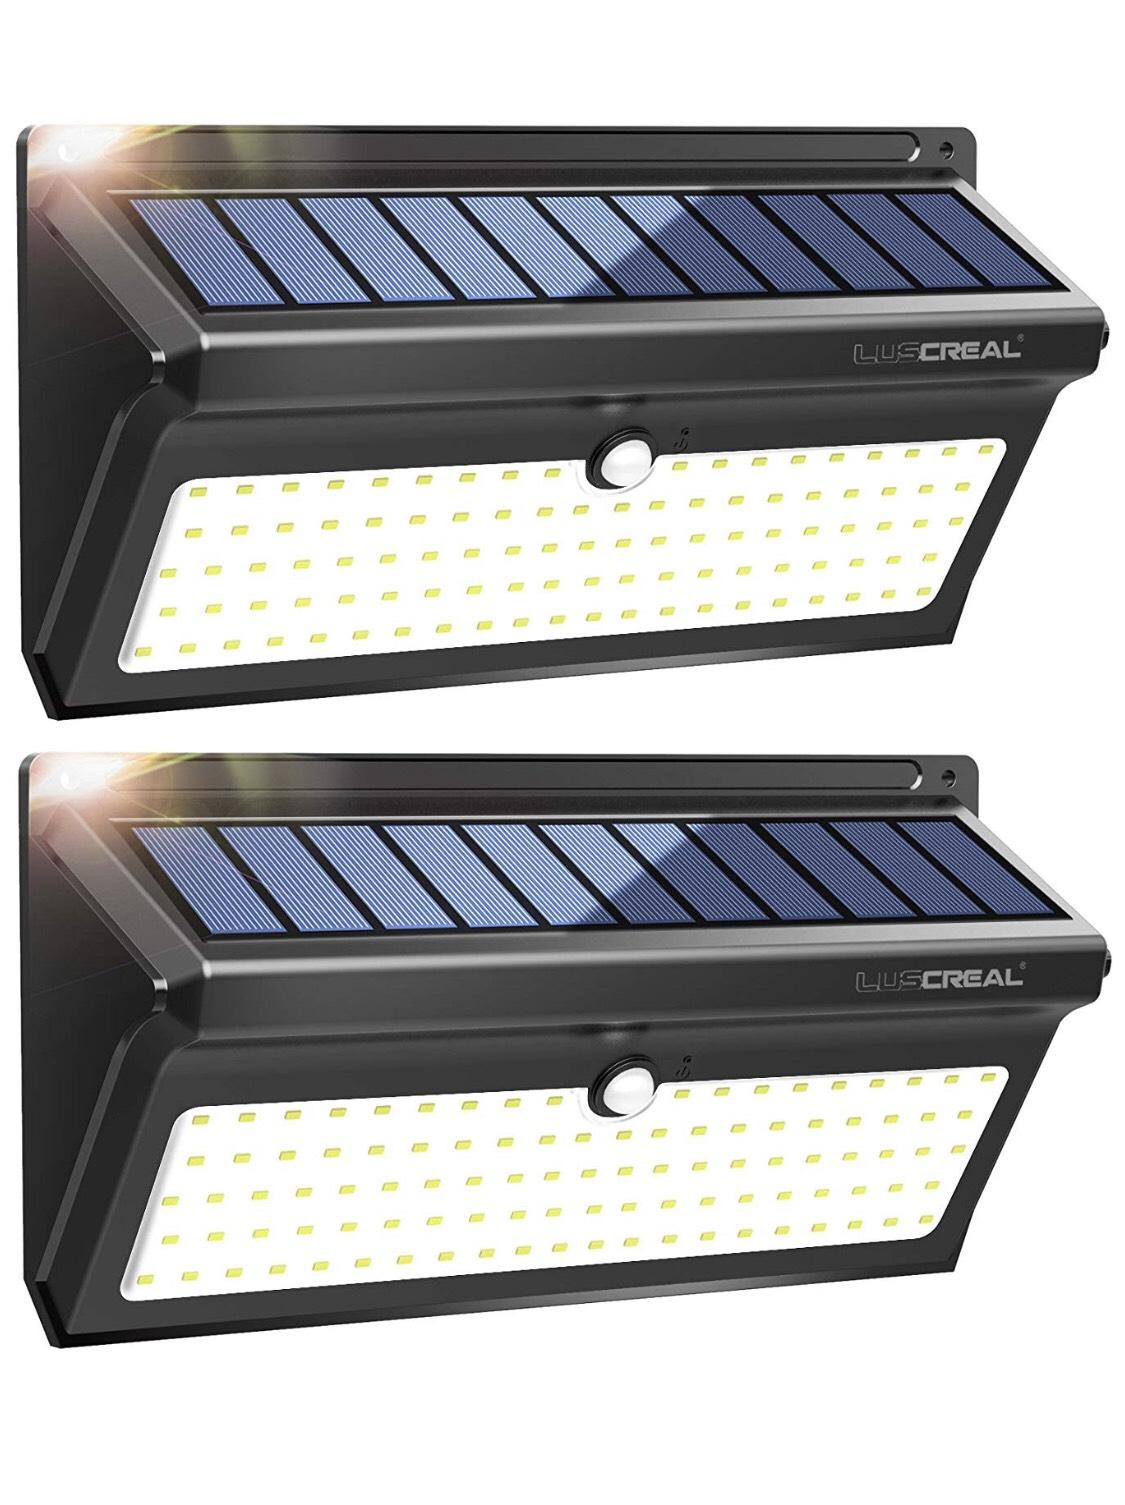 Luces solares para exterior